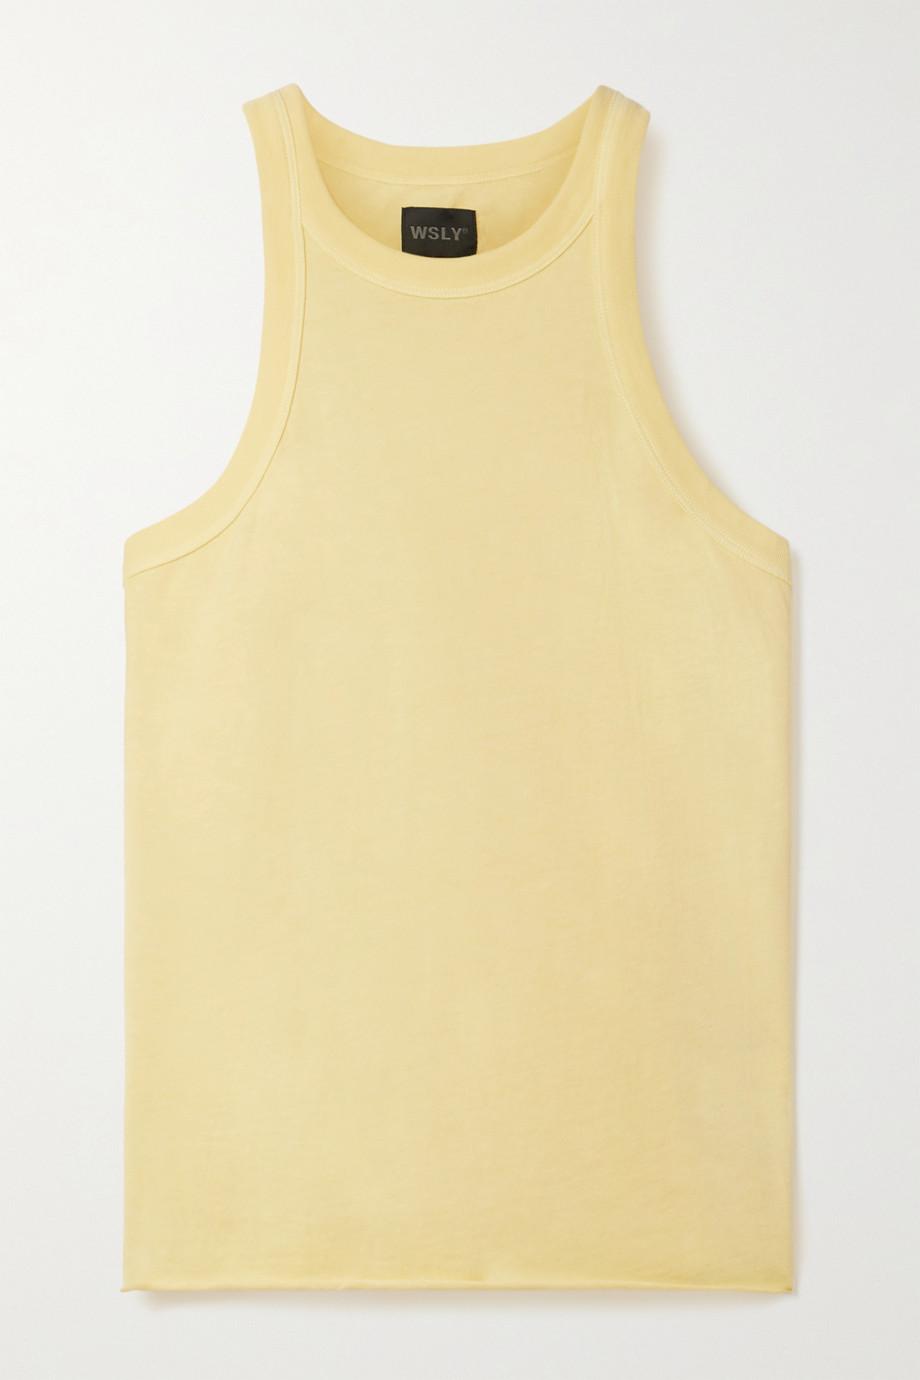 WSLY The Rivington organic cotton-jersey tank